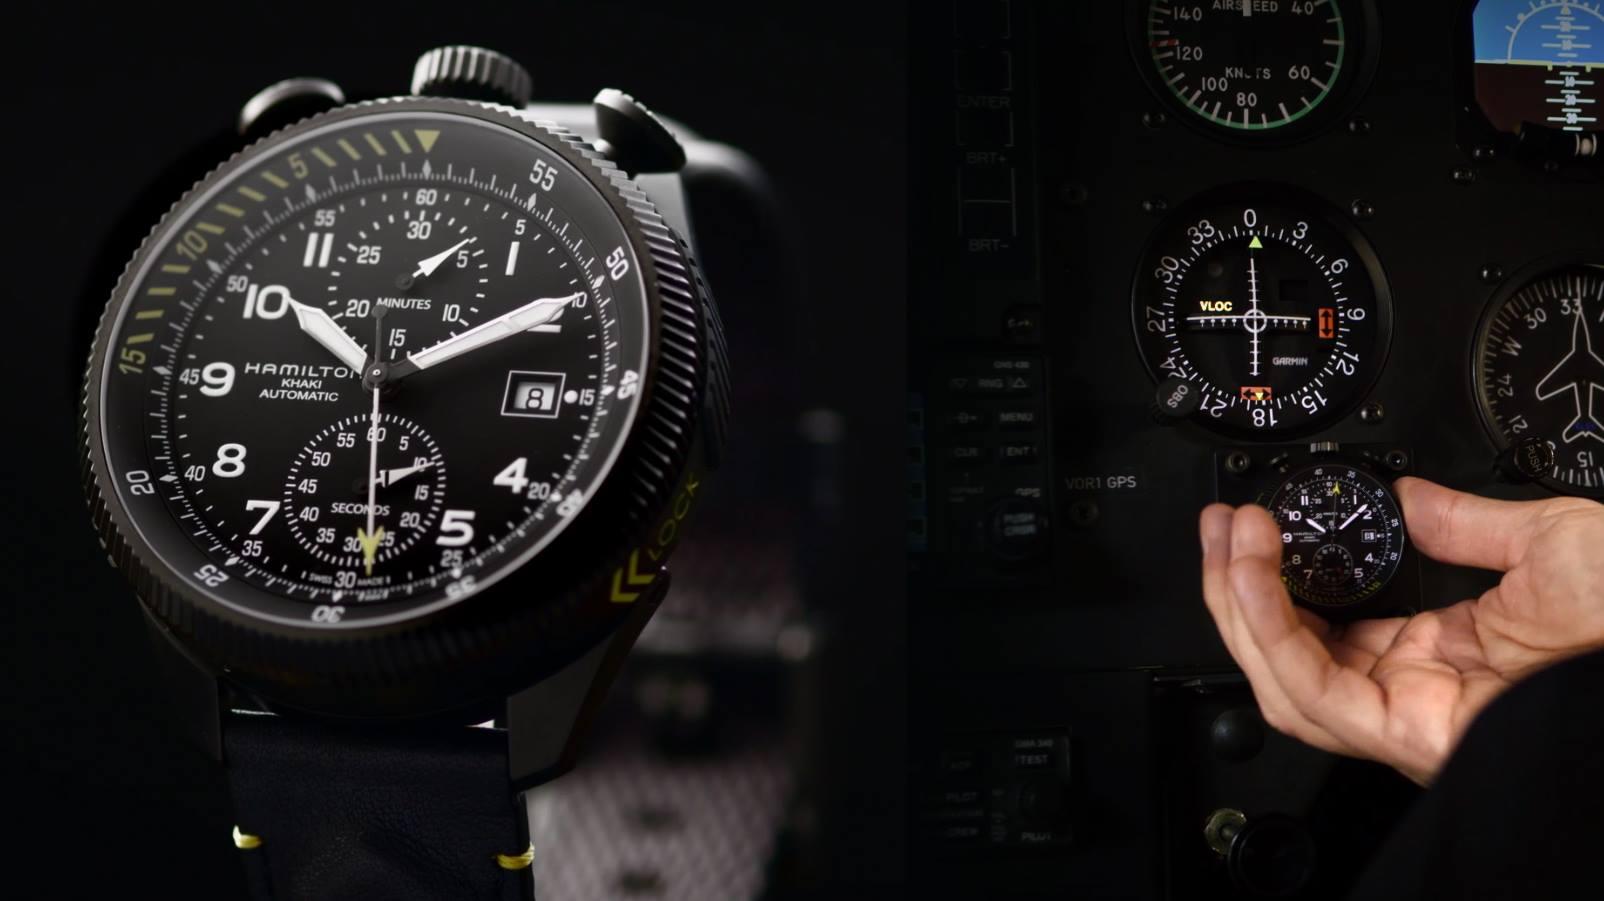 Naziv: Hamilton-Khaki-Takeoff-Auto-Chrono-Limited-Edition-watches-satovi-2.jpg, pregleda: 824, veličina: 94,7 KB